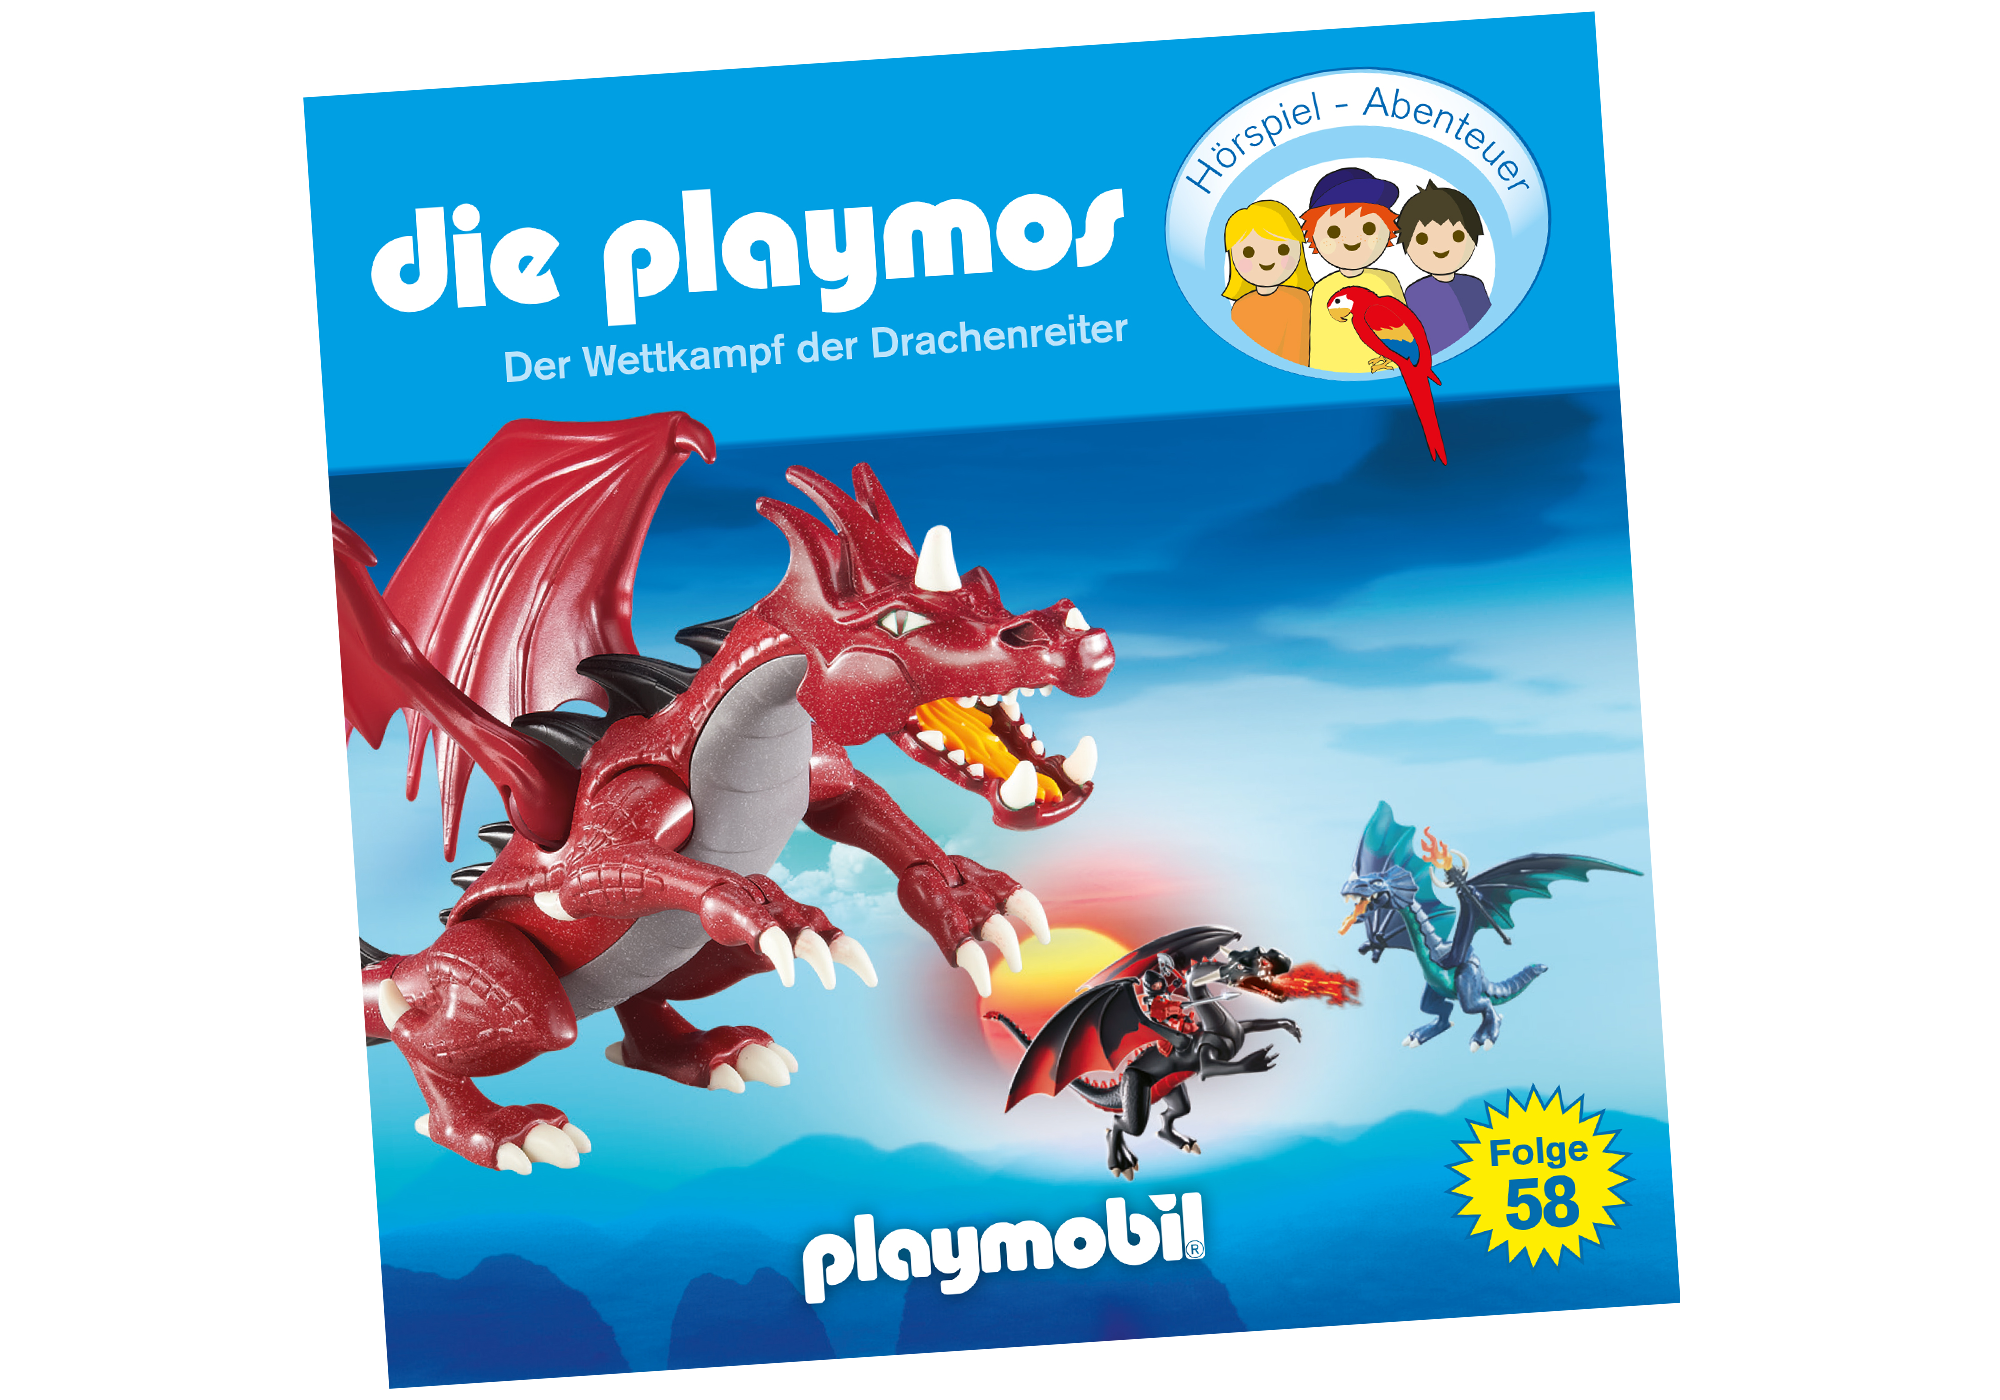 http://media.playmobil.com/i/playmobil/80041_product_detail